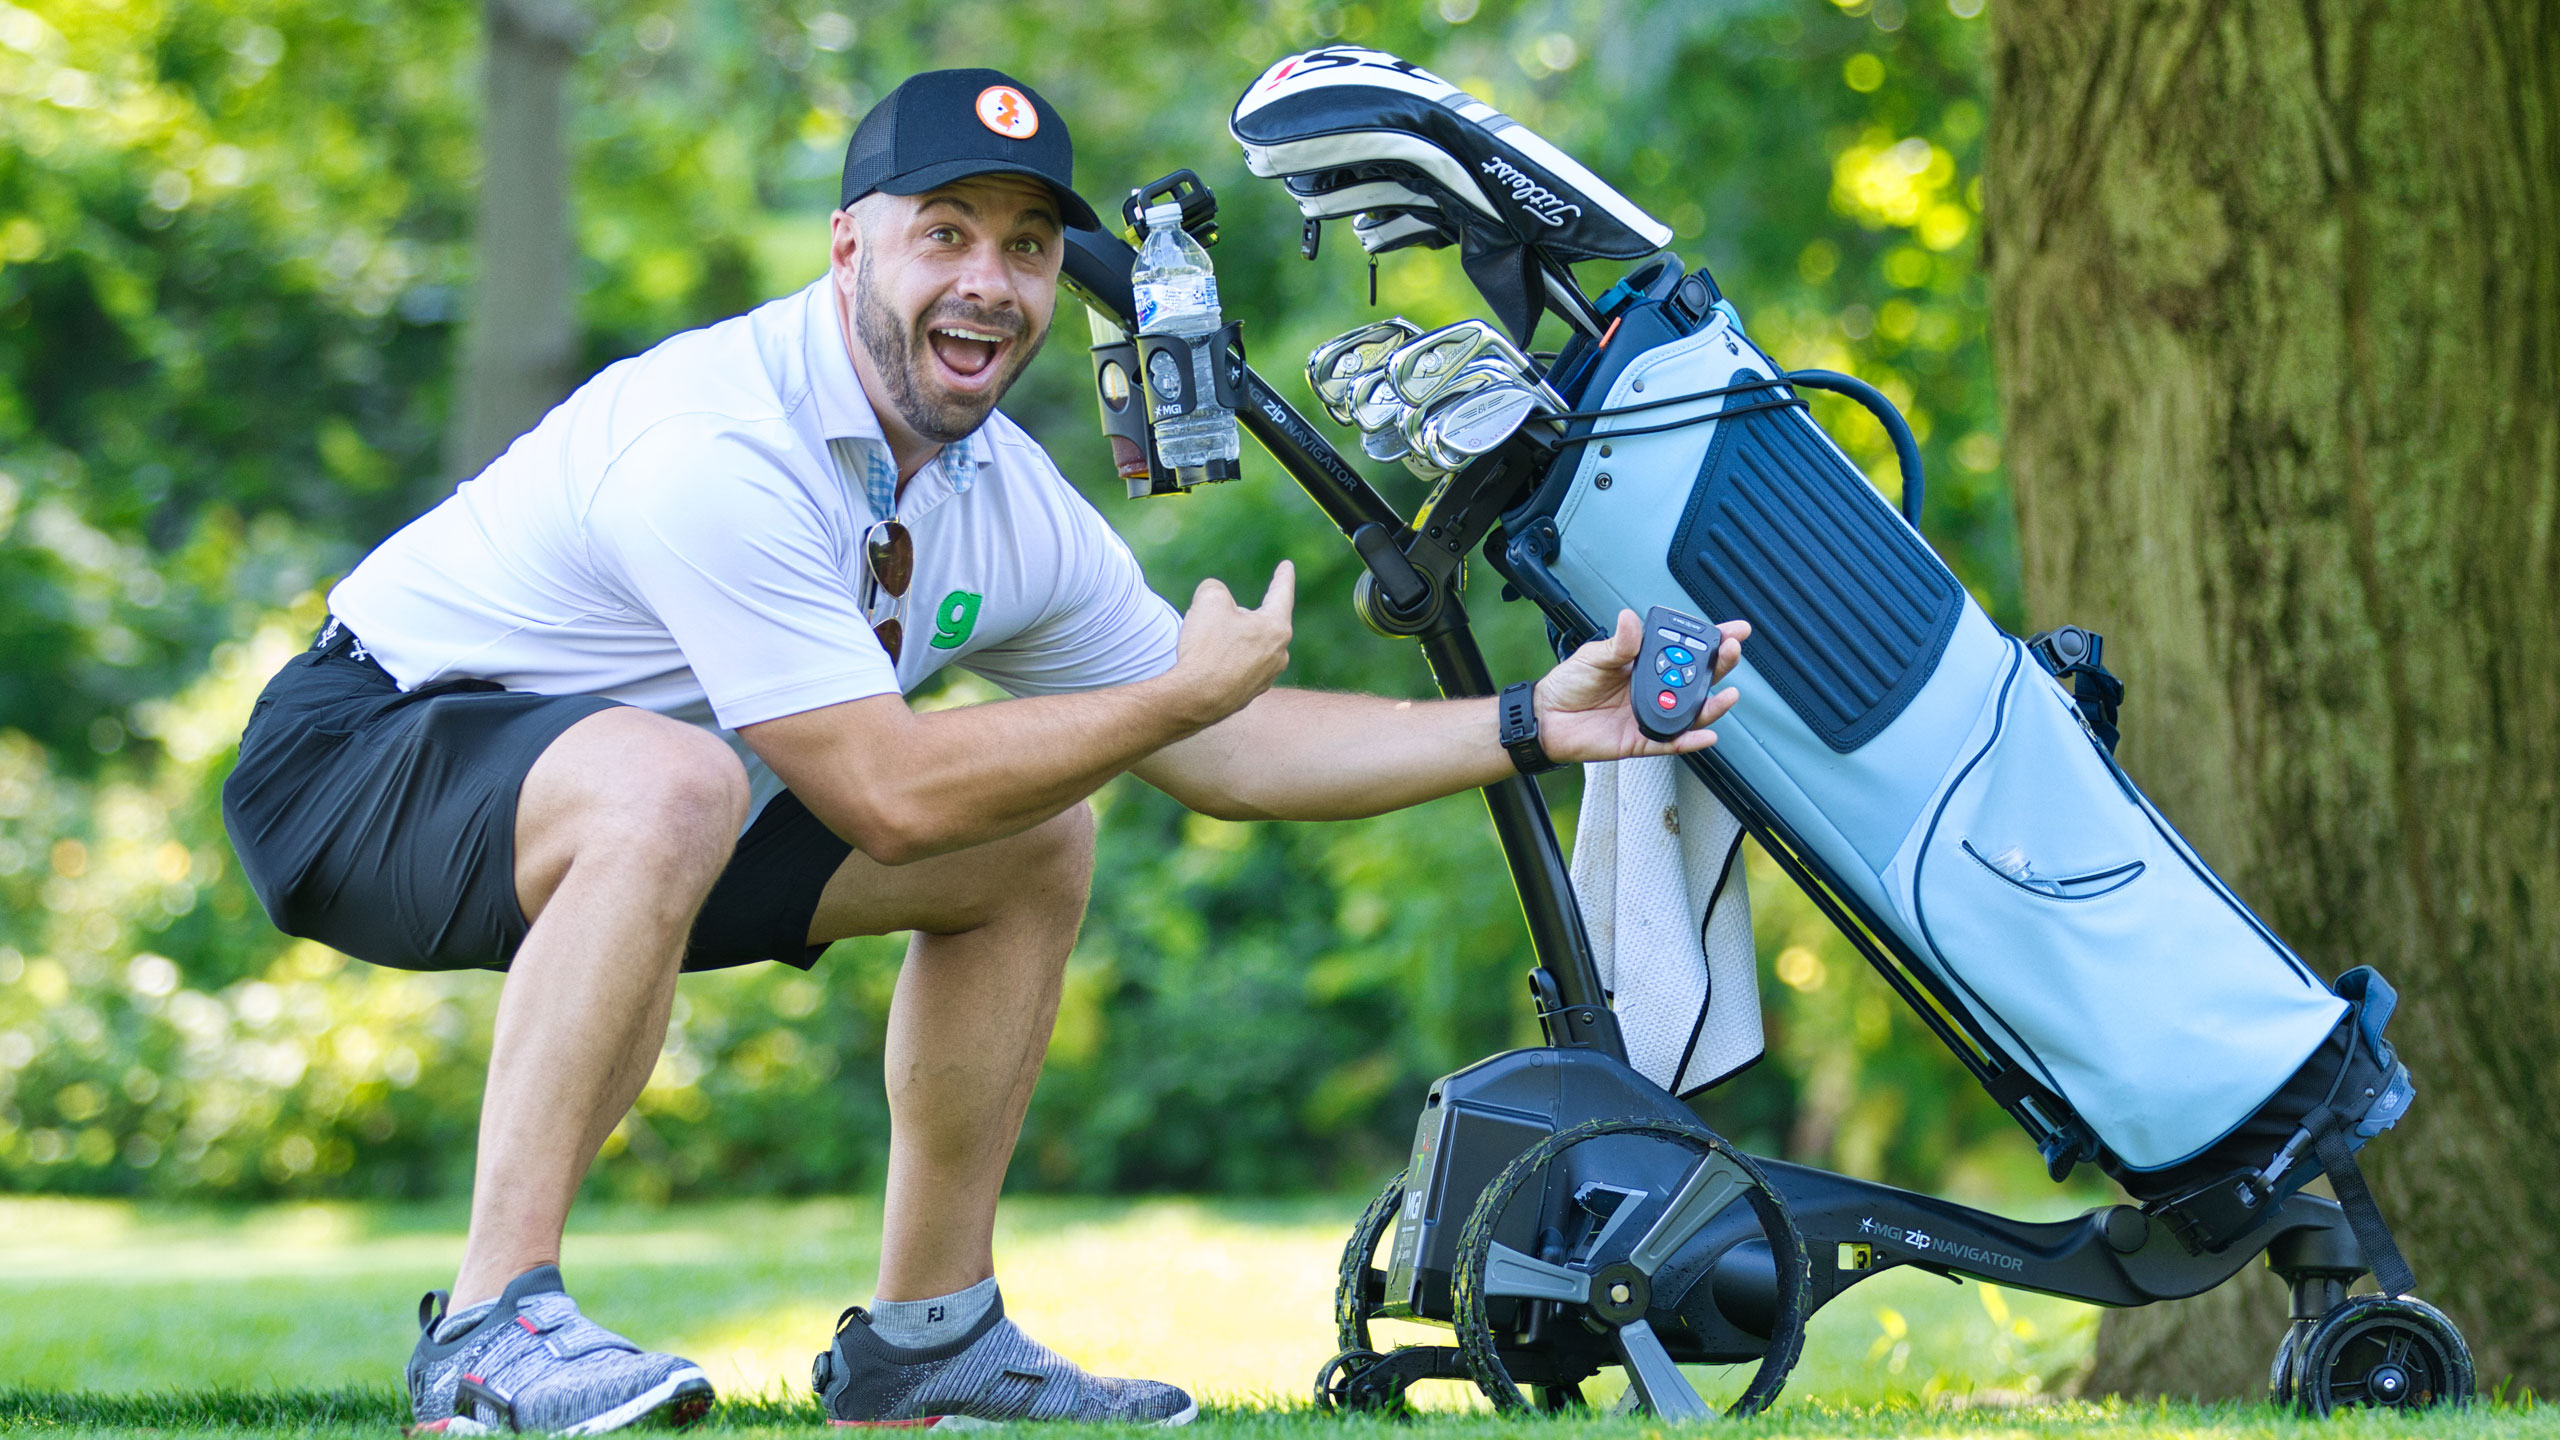 Golficity MGI Zip Navigator Giveaway worth $1500 Giveaway Image